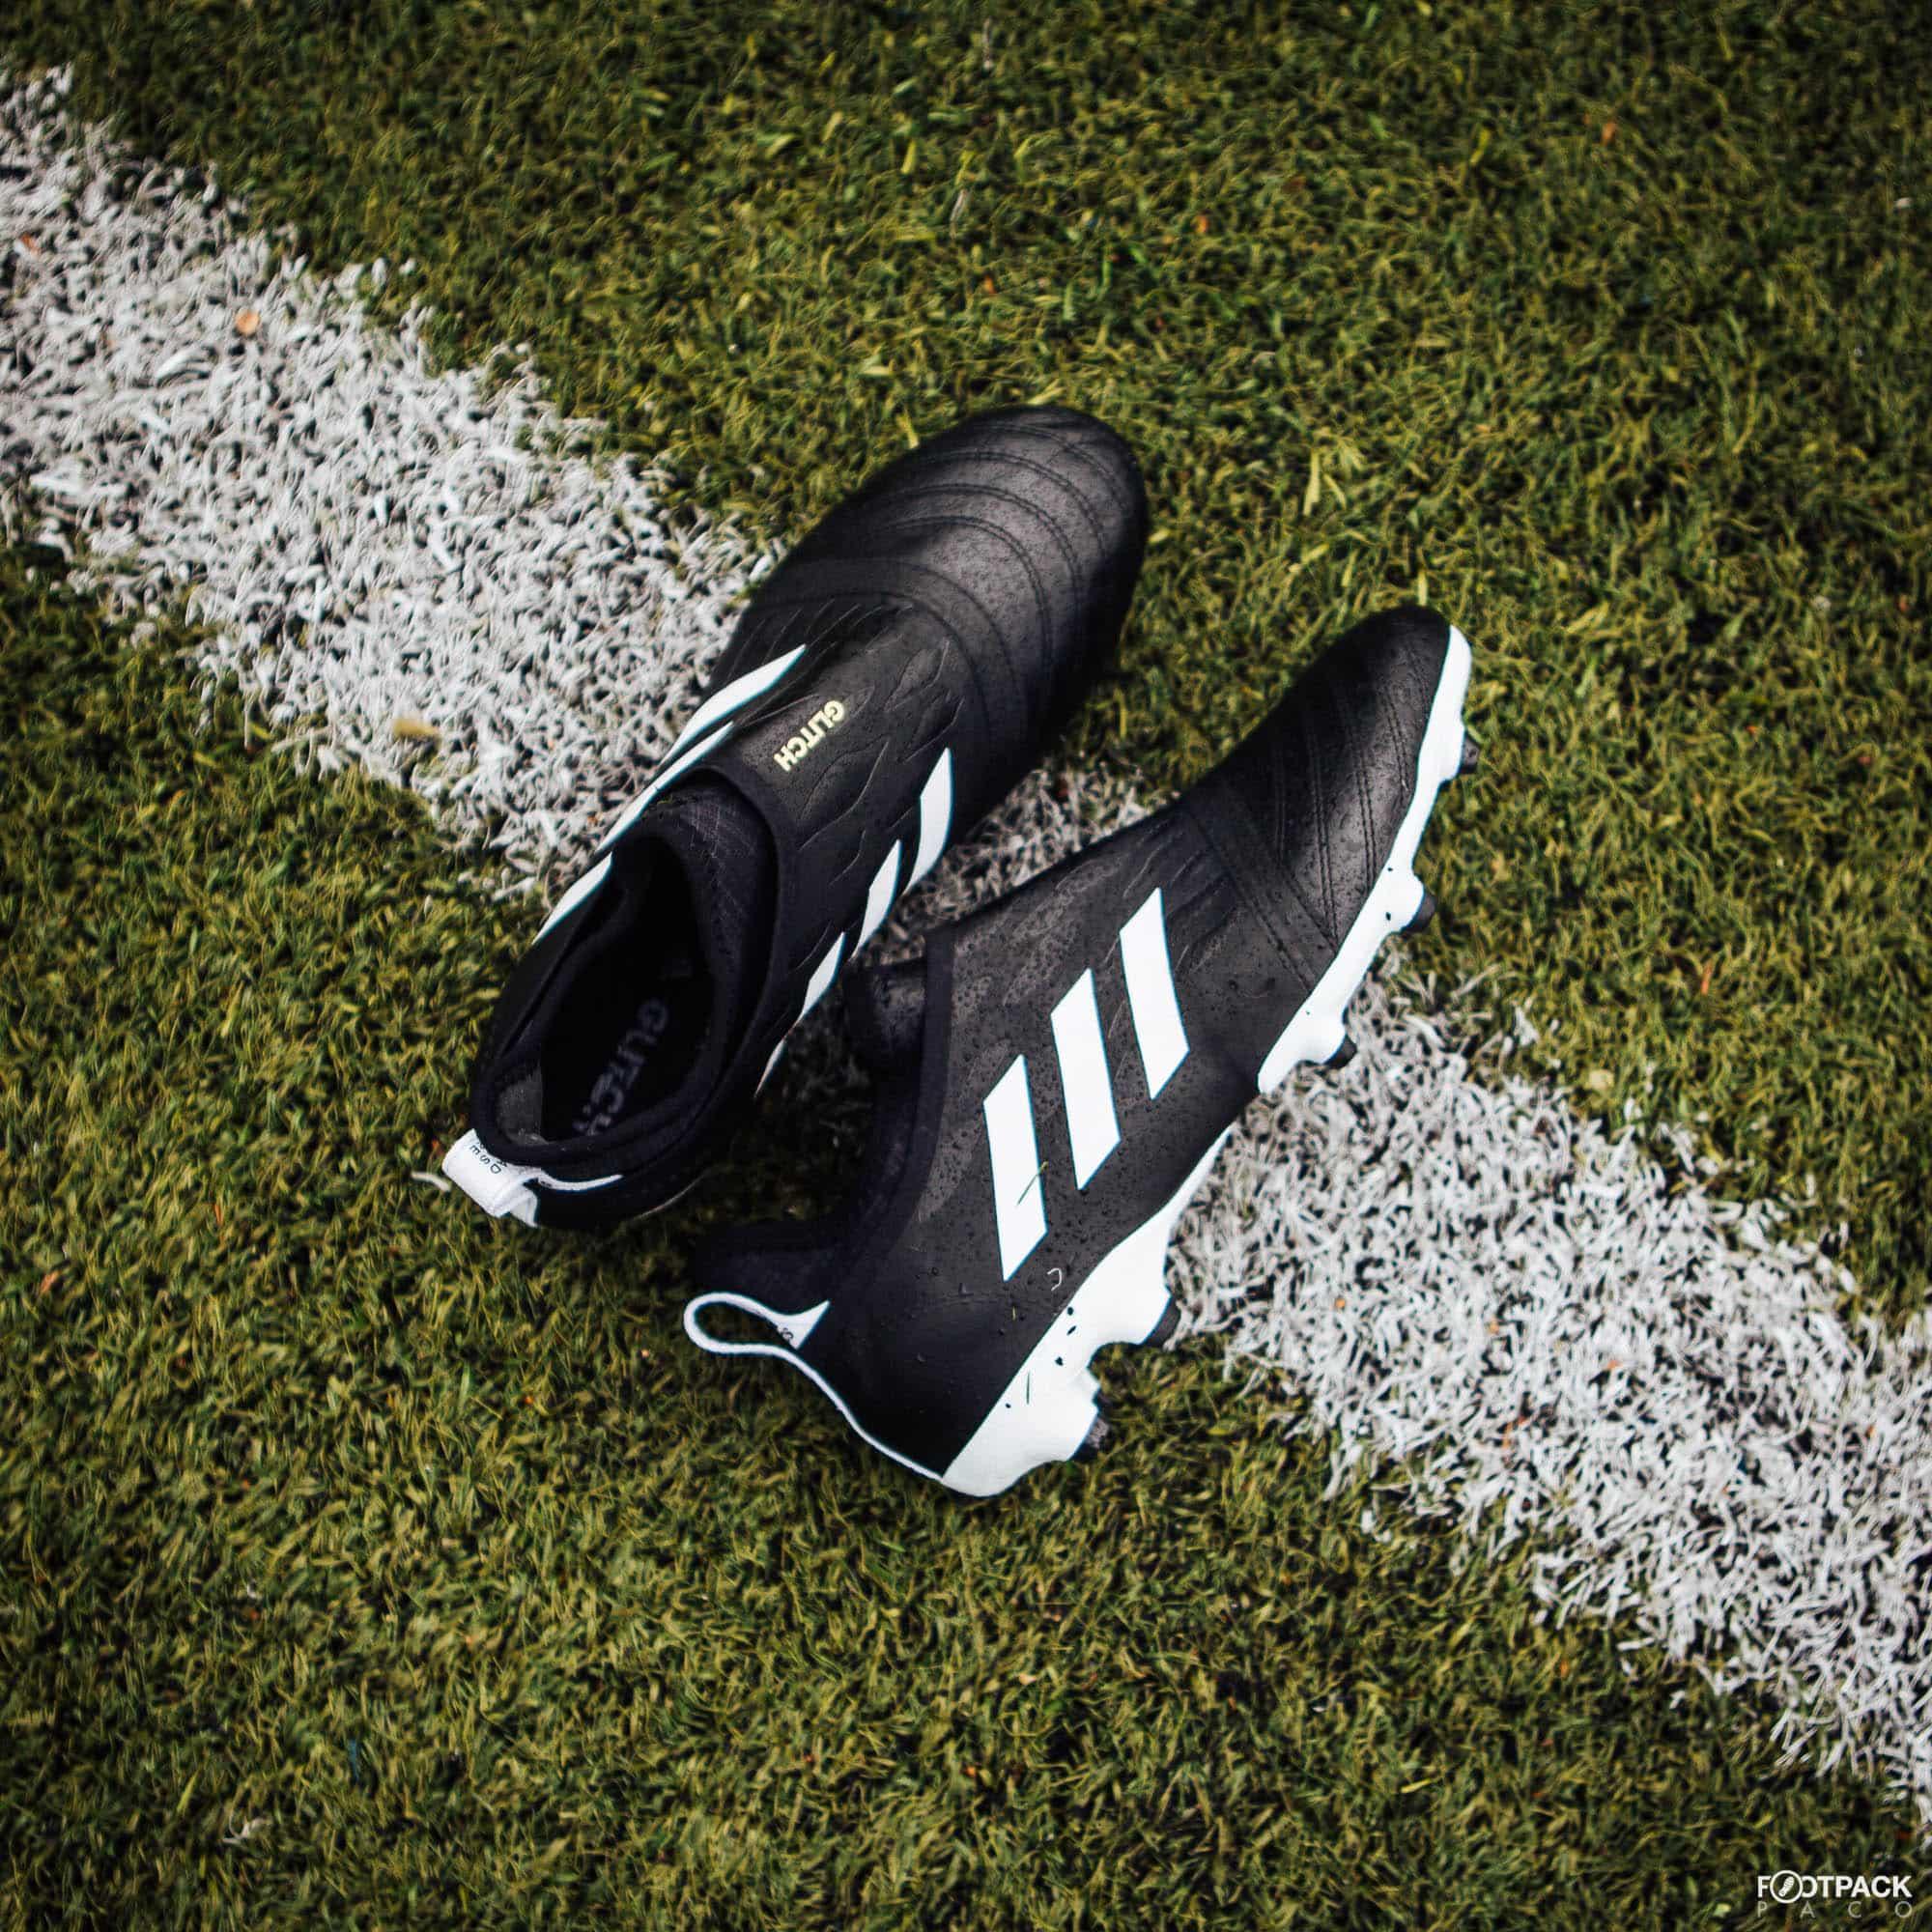 Chaussures-football-adidas-glitch-copa-mai-2018-2